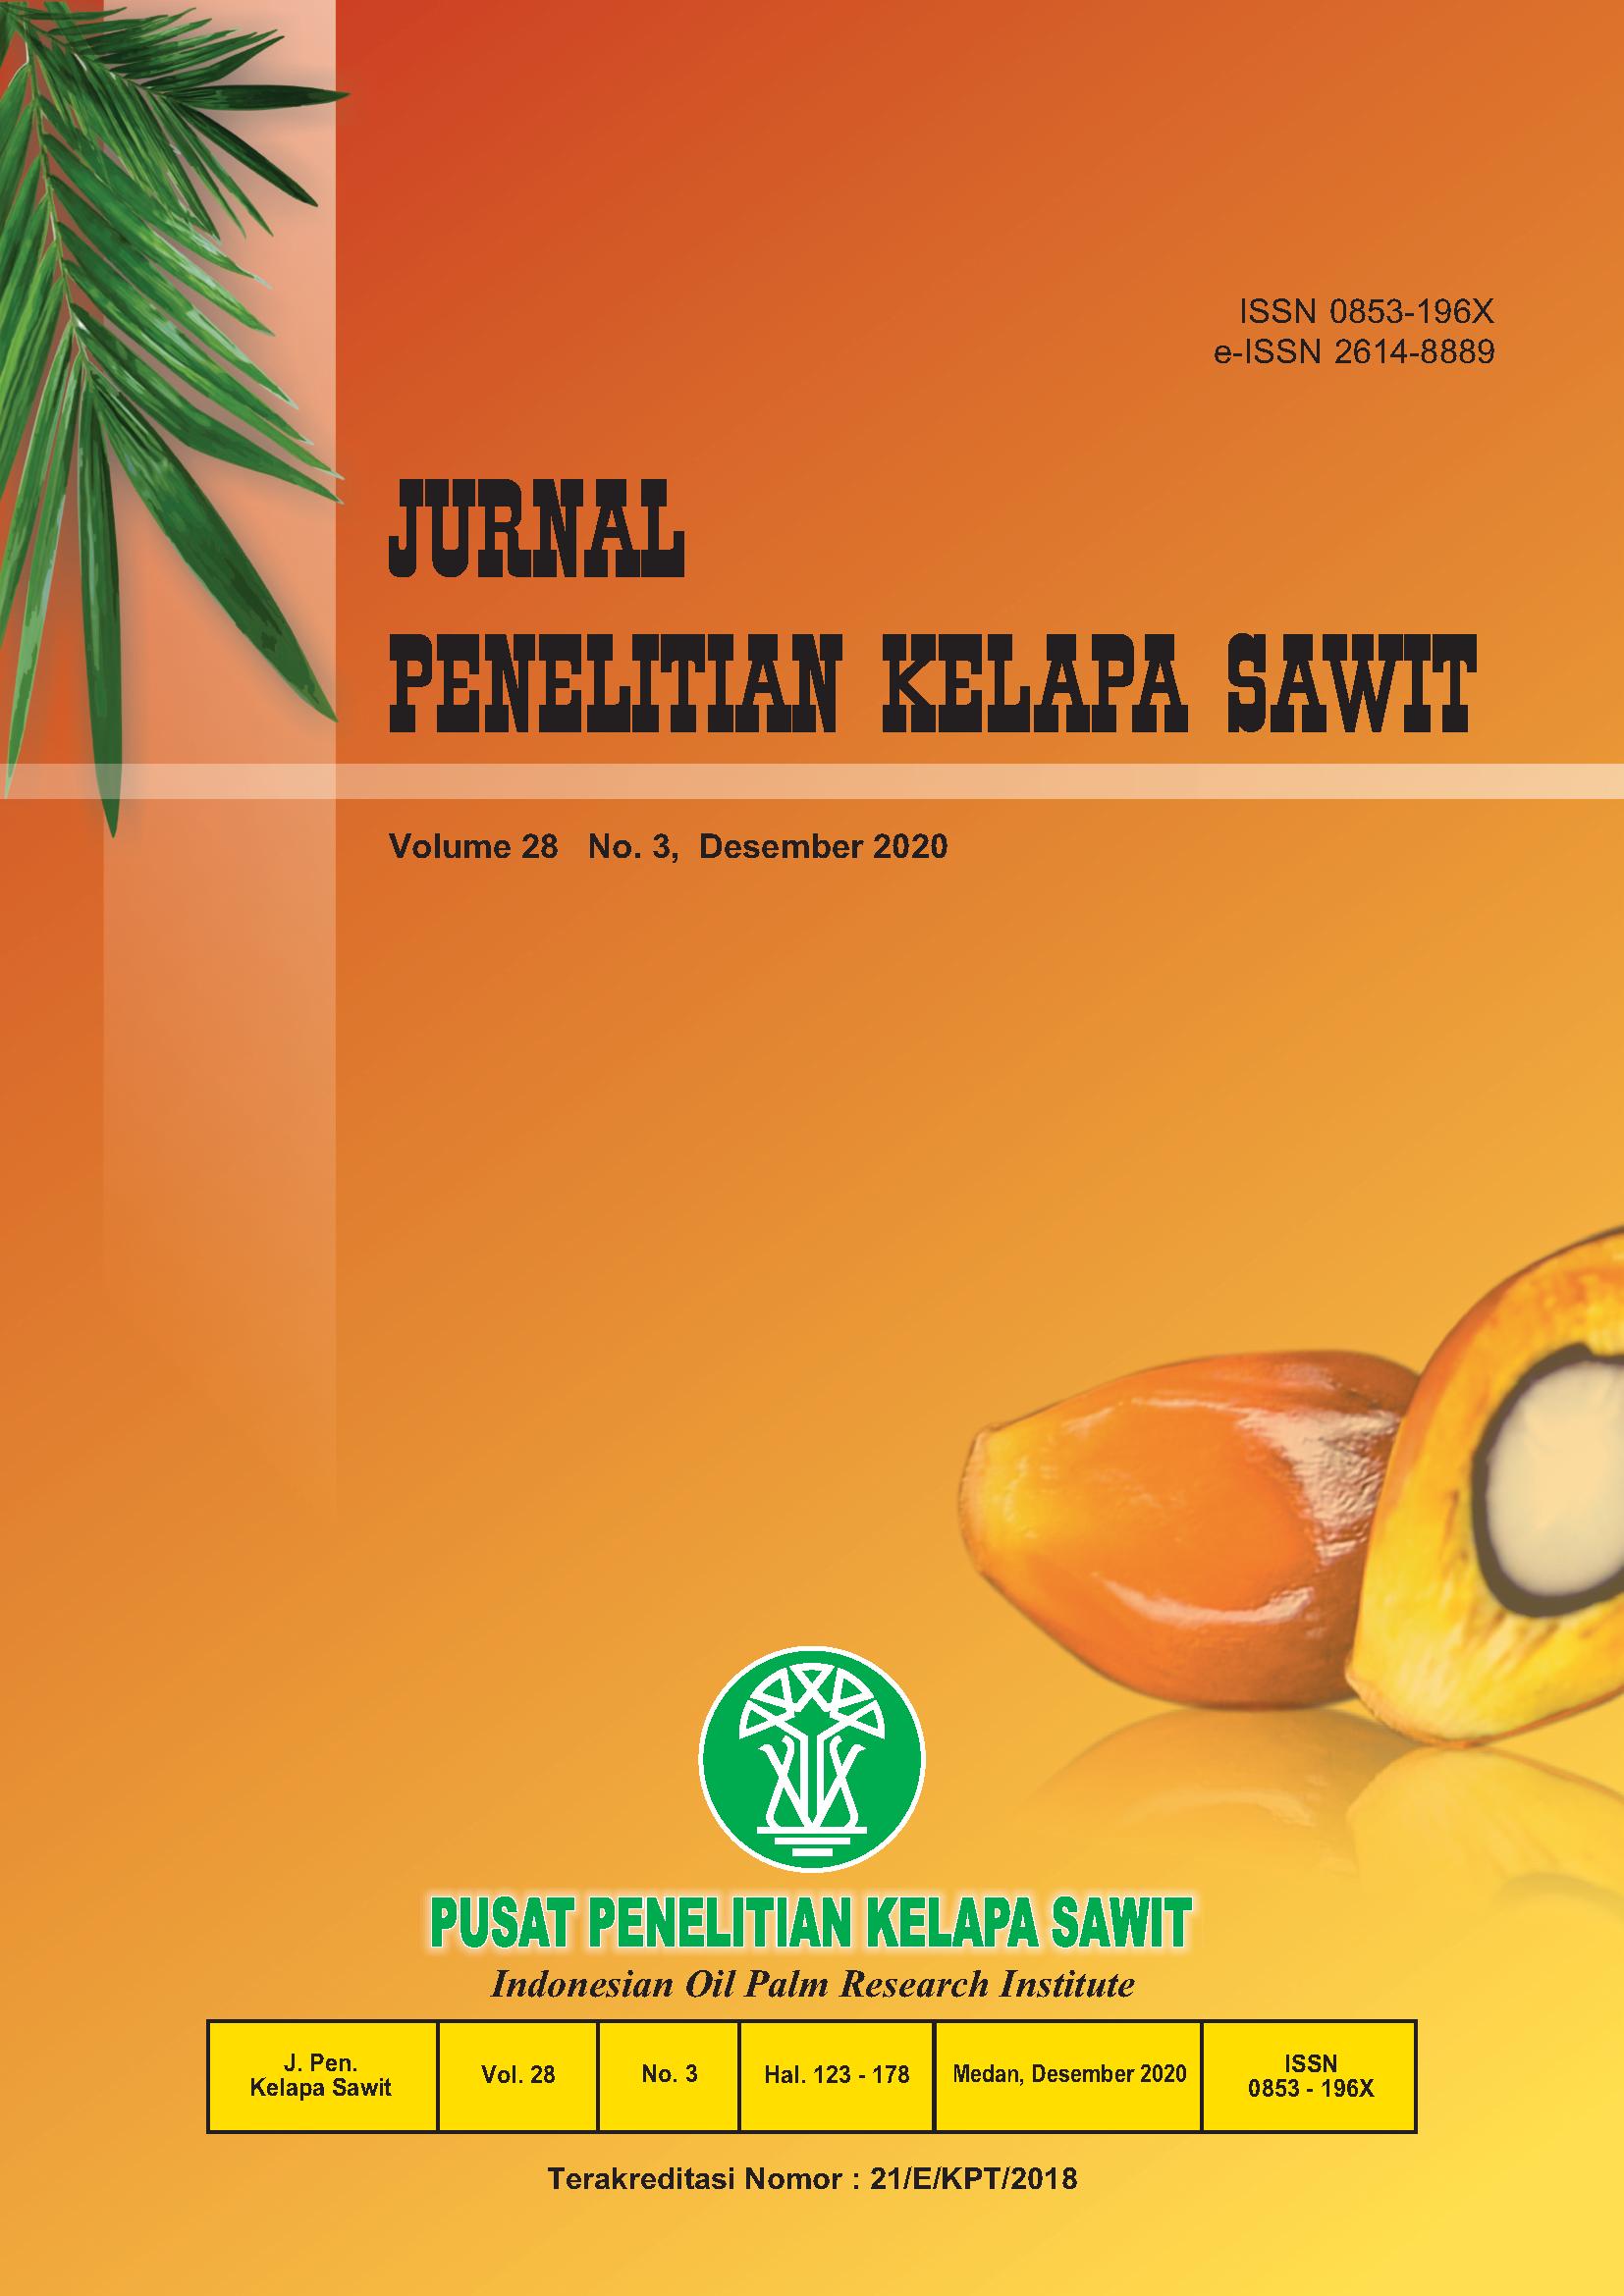 #kelapa sawit #ppks #iopri #oil palm